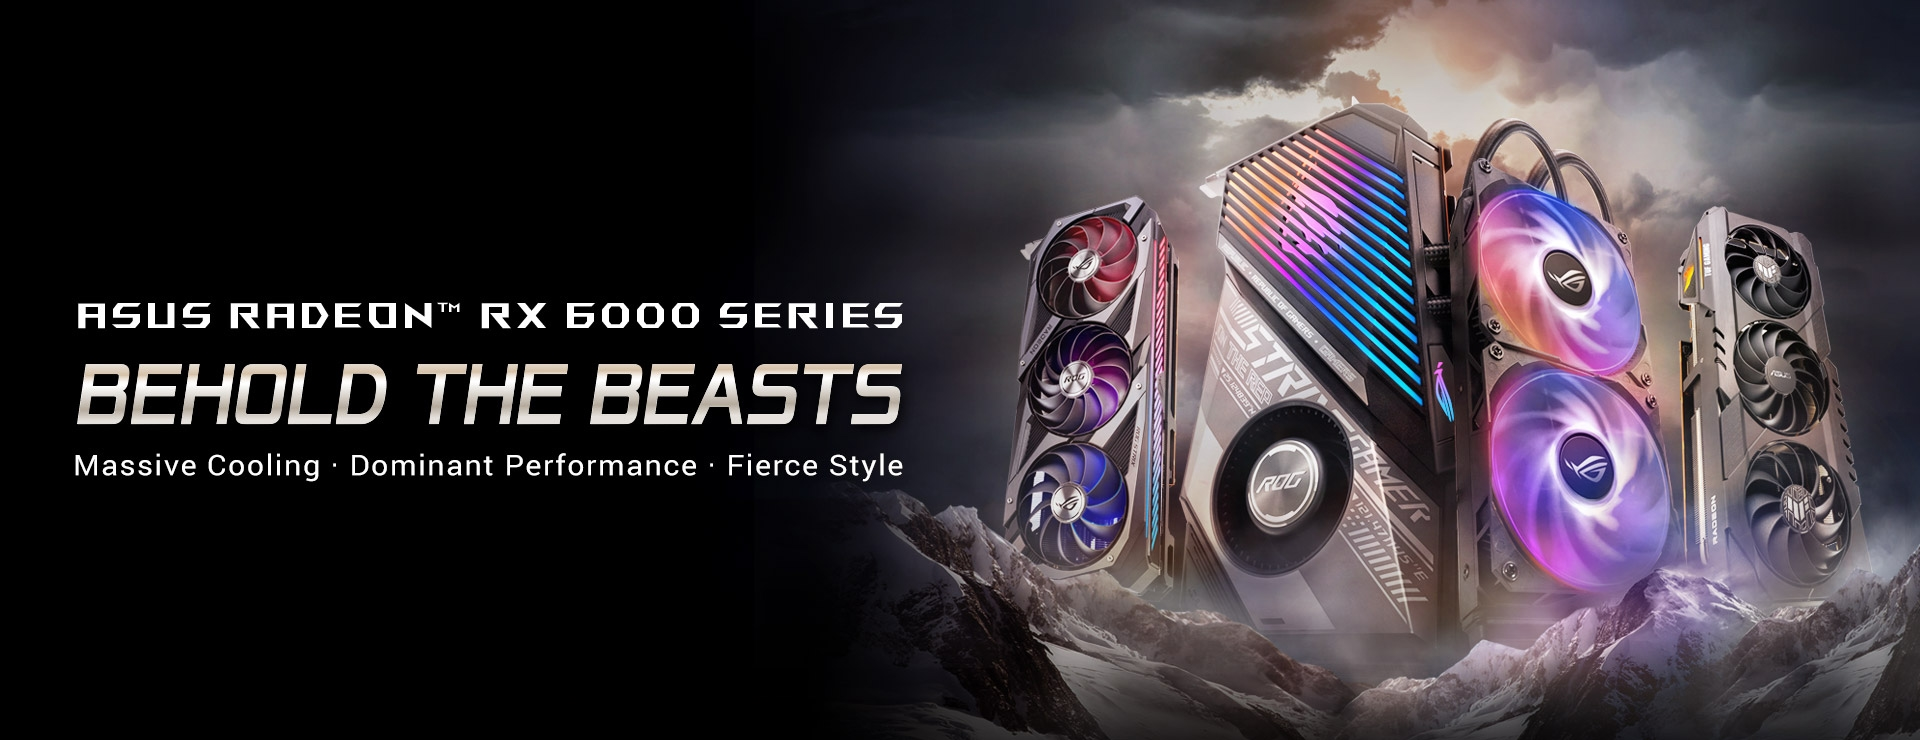 ASUS Radeon RX 6000 Series